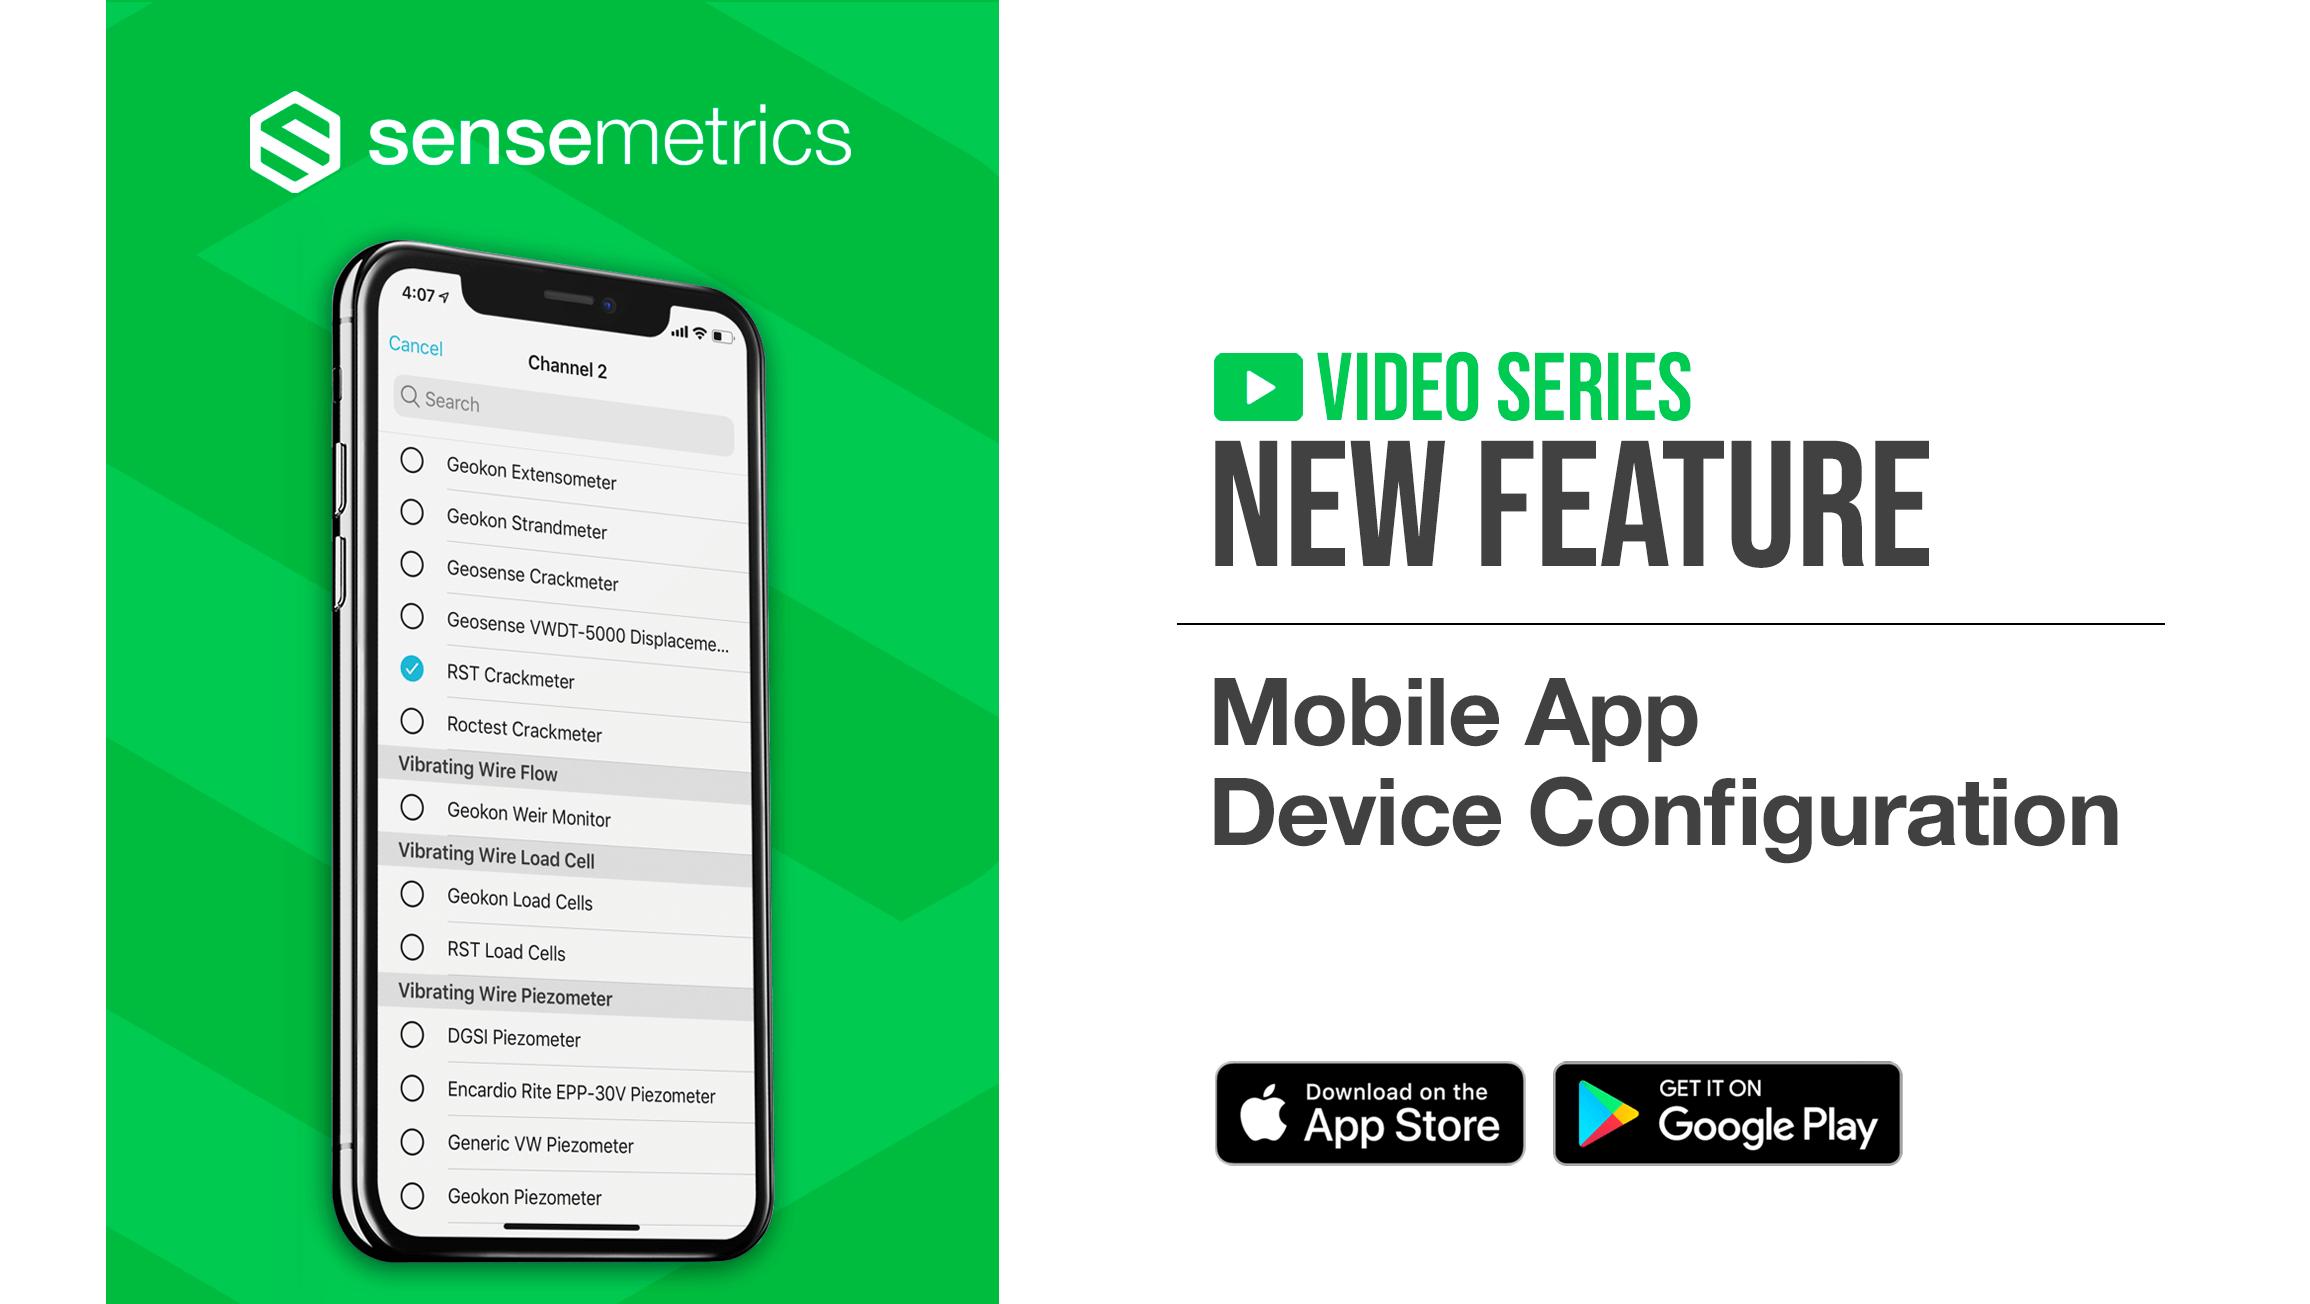 New Mobile App Feature: Device Configuration